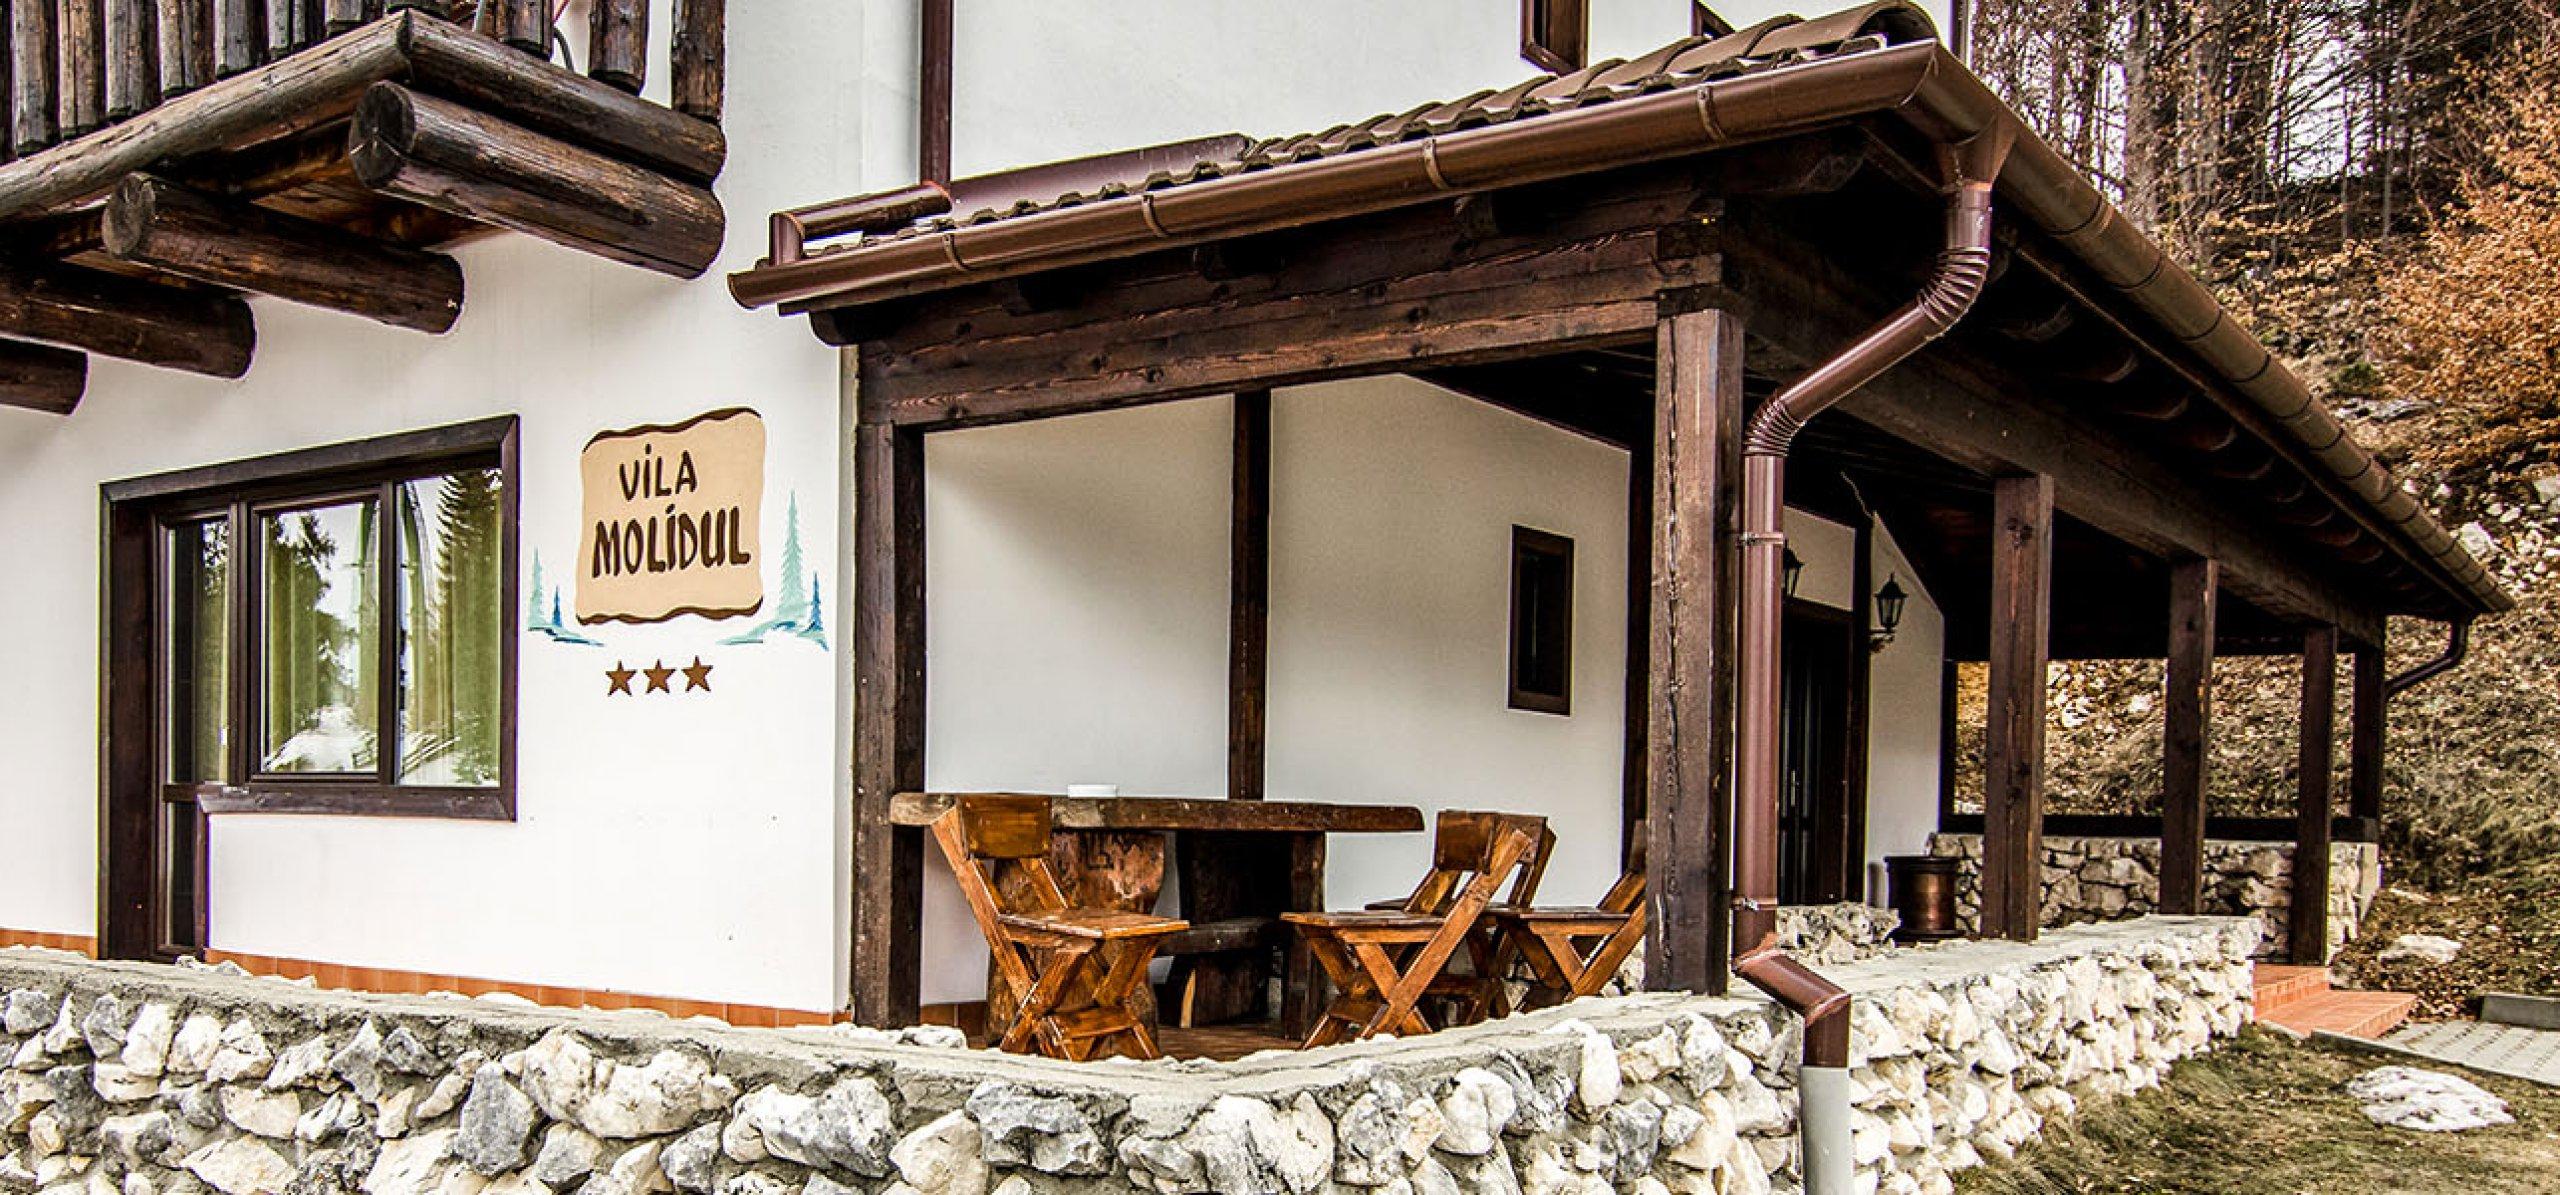 terasa-vila-pinul-cazare-cheile-gradistei-fundata